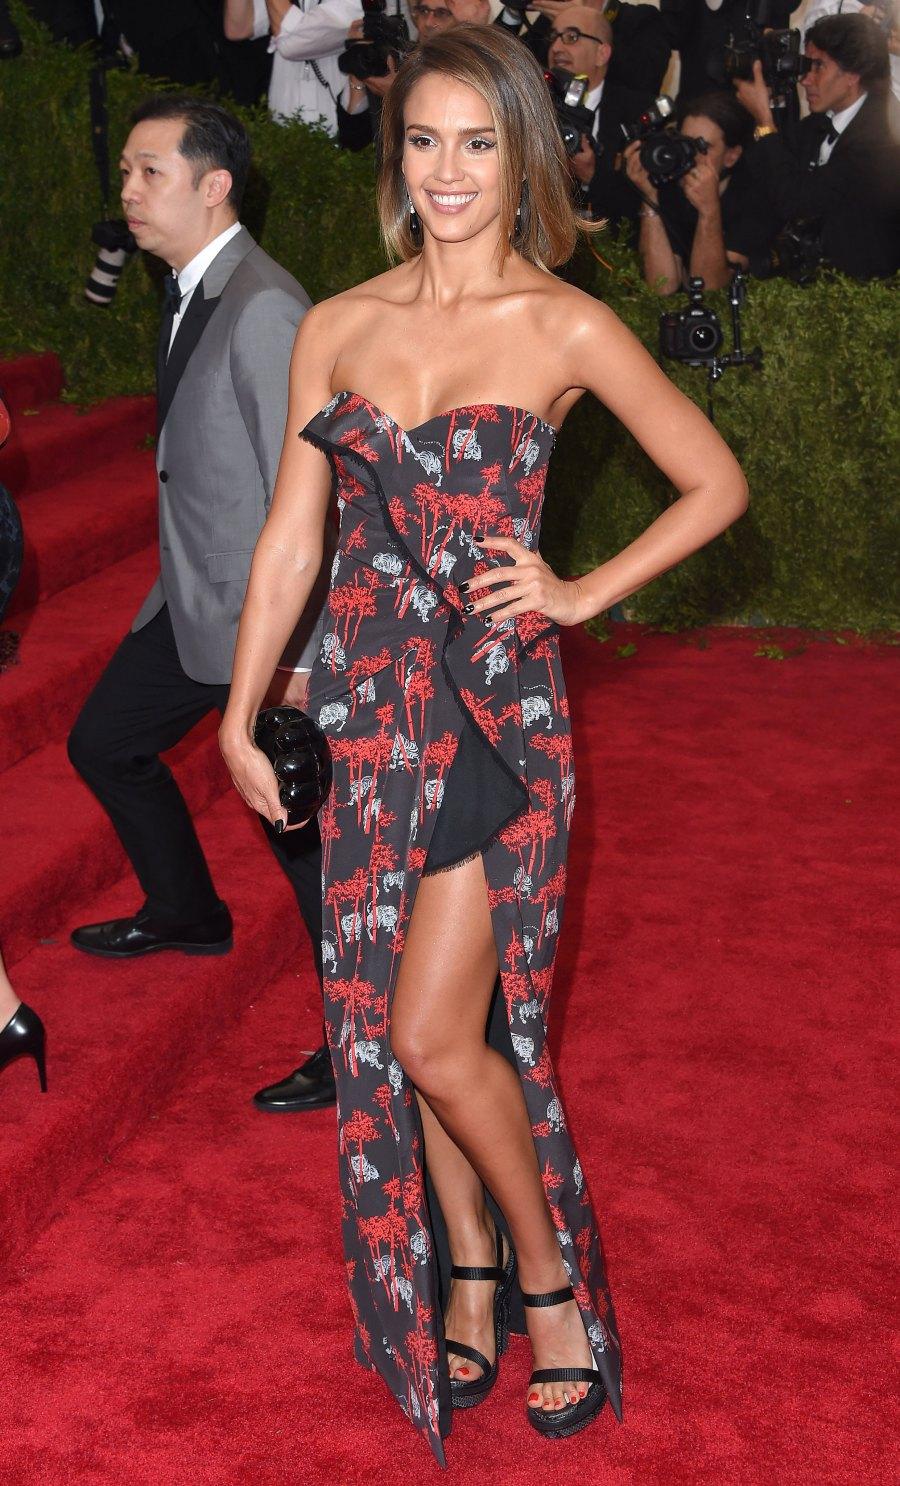 Jessica Alba - Top Best looks - photos, video